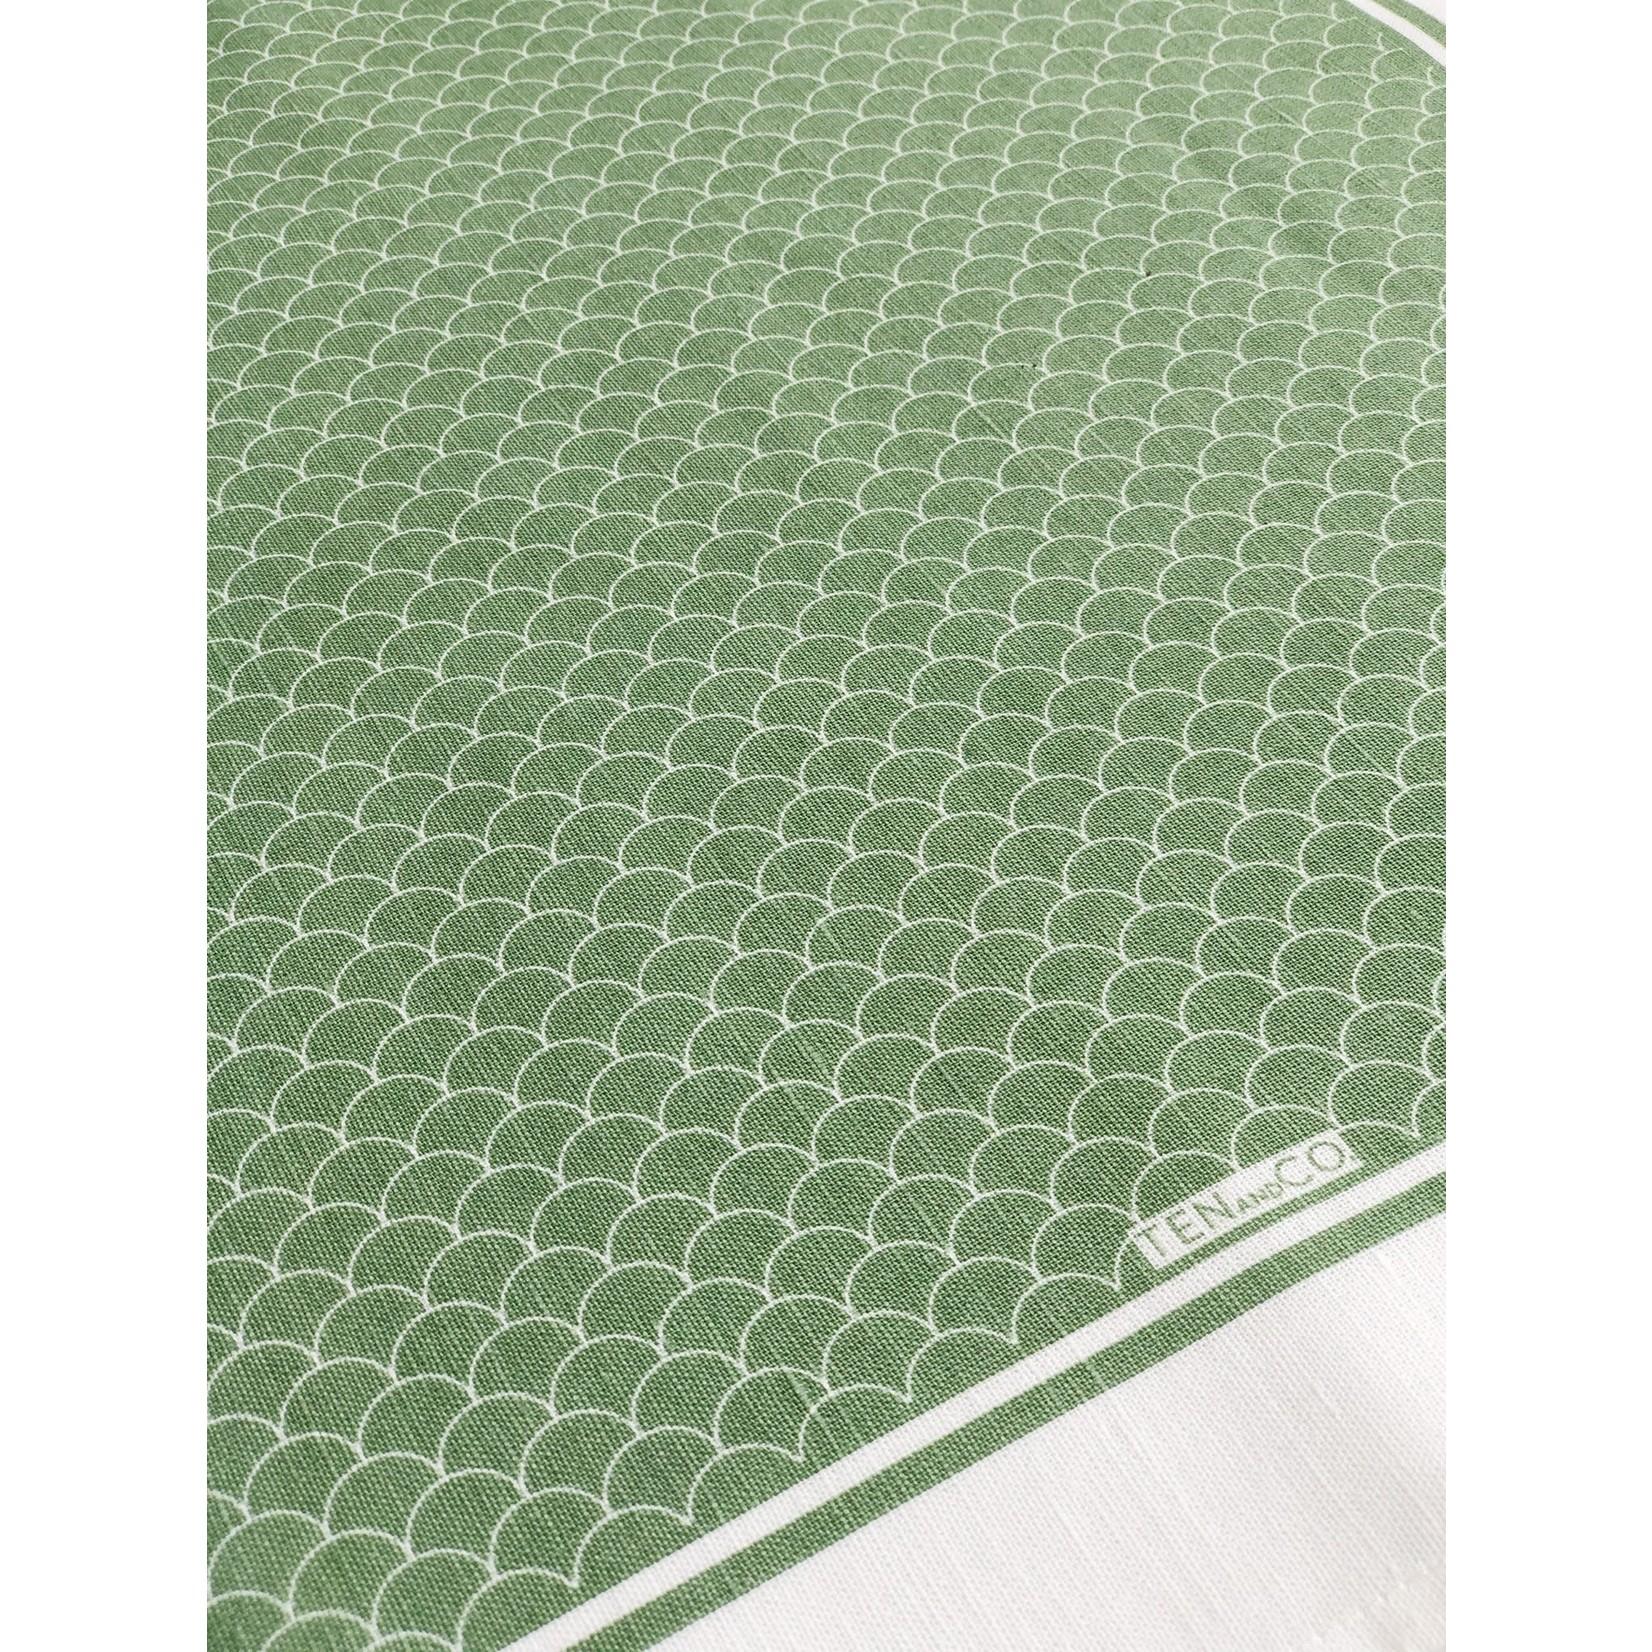 TEN AND CO. TEA TOWEL - SCALLOP SAGE